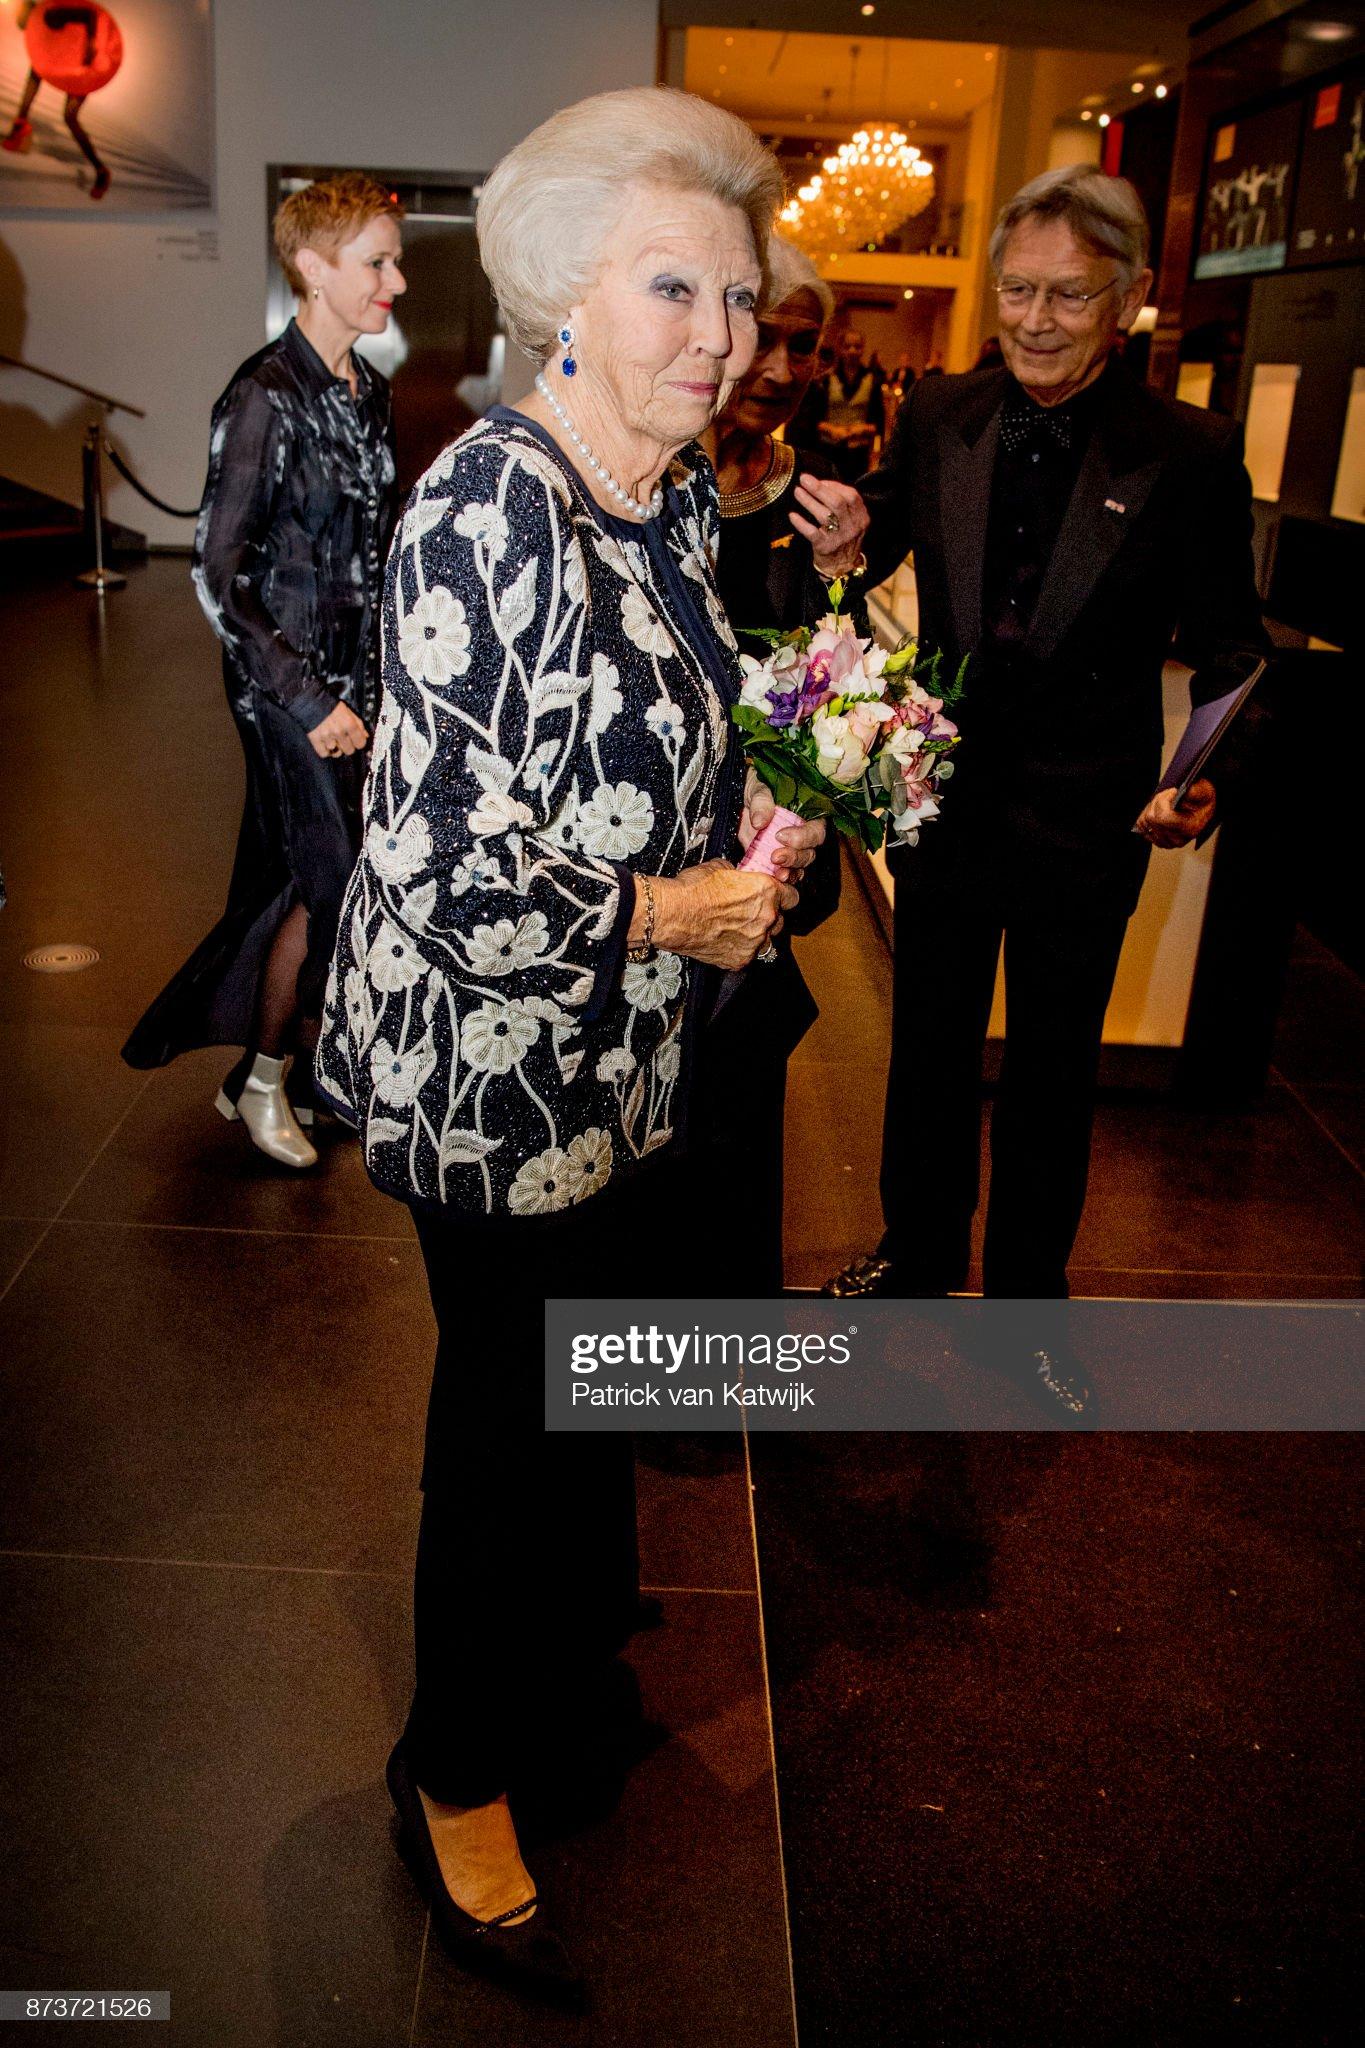 Princess Beatrix at Balletgala Dansersfonds in DeLaMar theater Amsterdam : News Photo